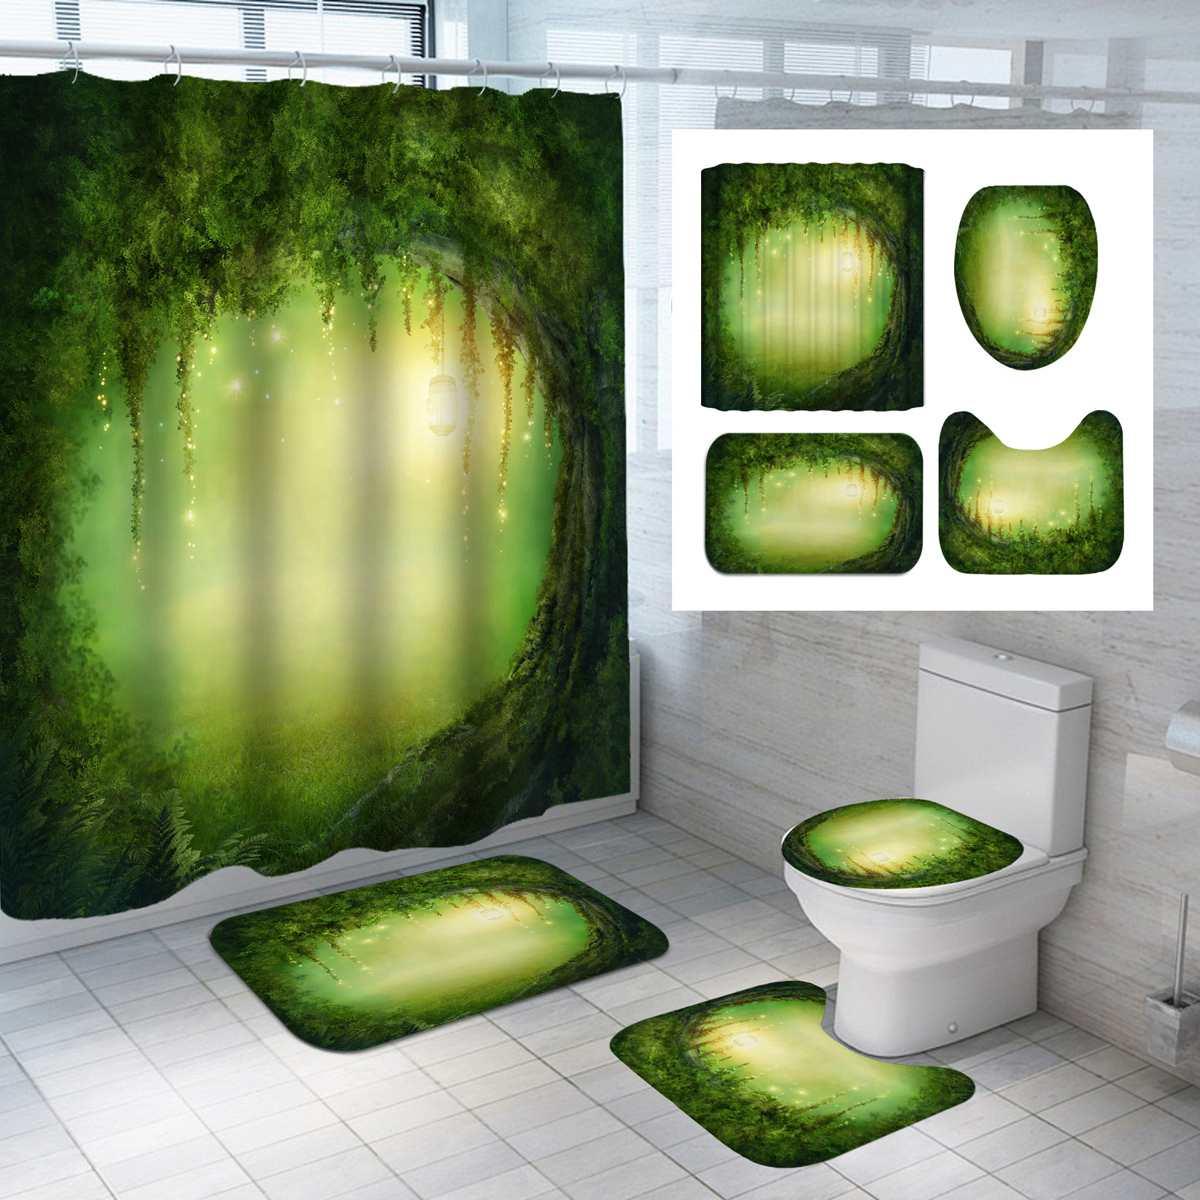 Bathroom Shower Curtain Waterproof Pedestal Rug Lid Bath Carpet Toilet Cover Bath Mat Set 180x180cm